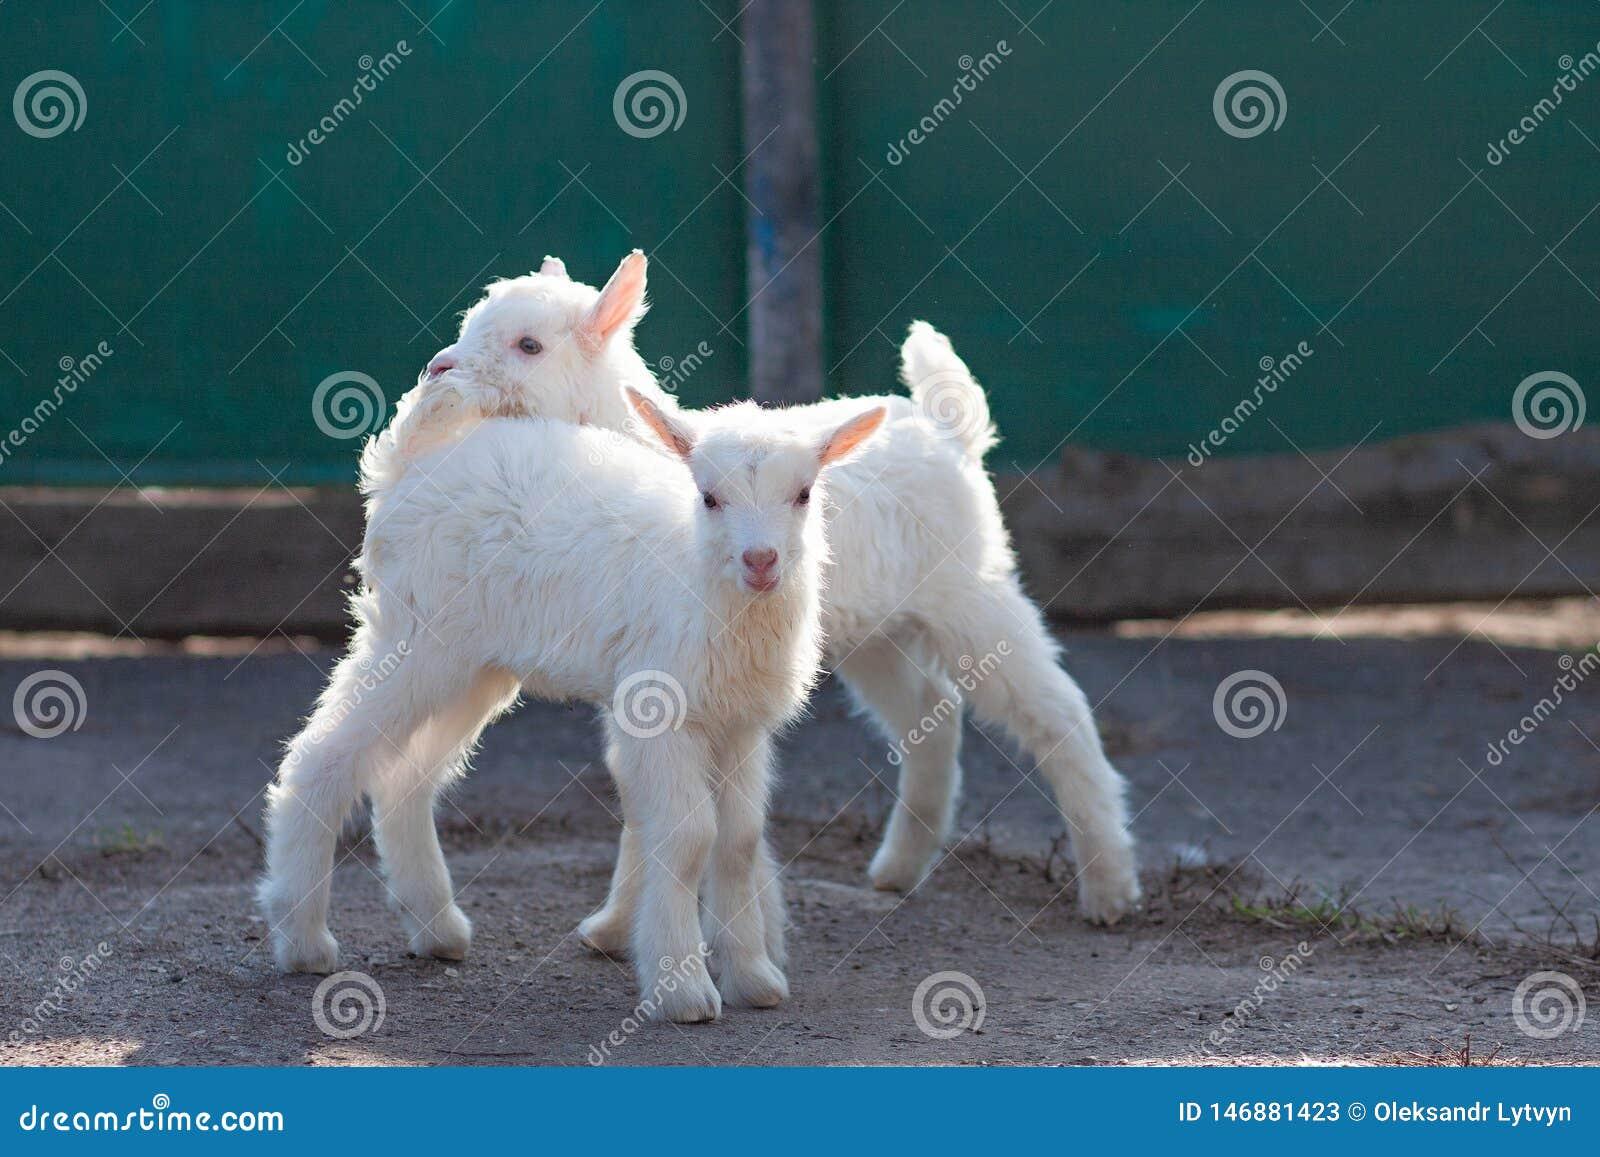 Petits goatlings gentils blancs explorant le monde